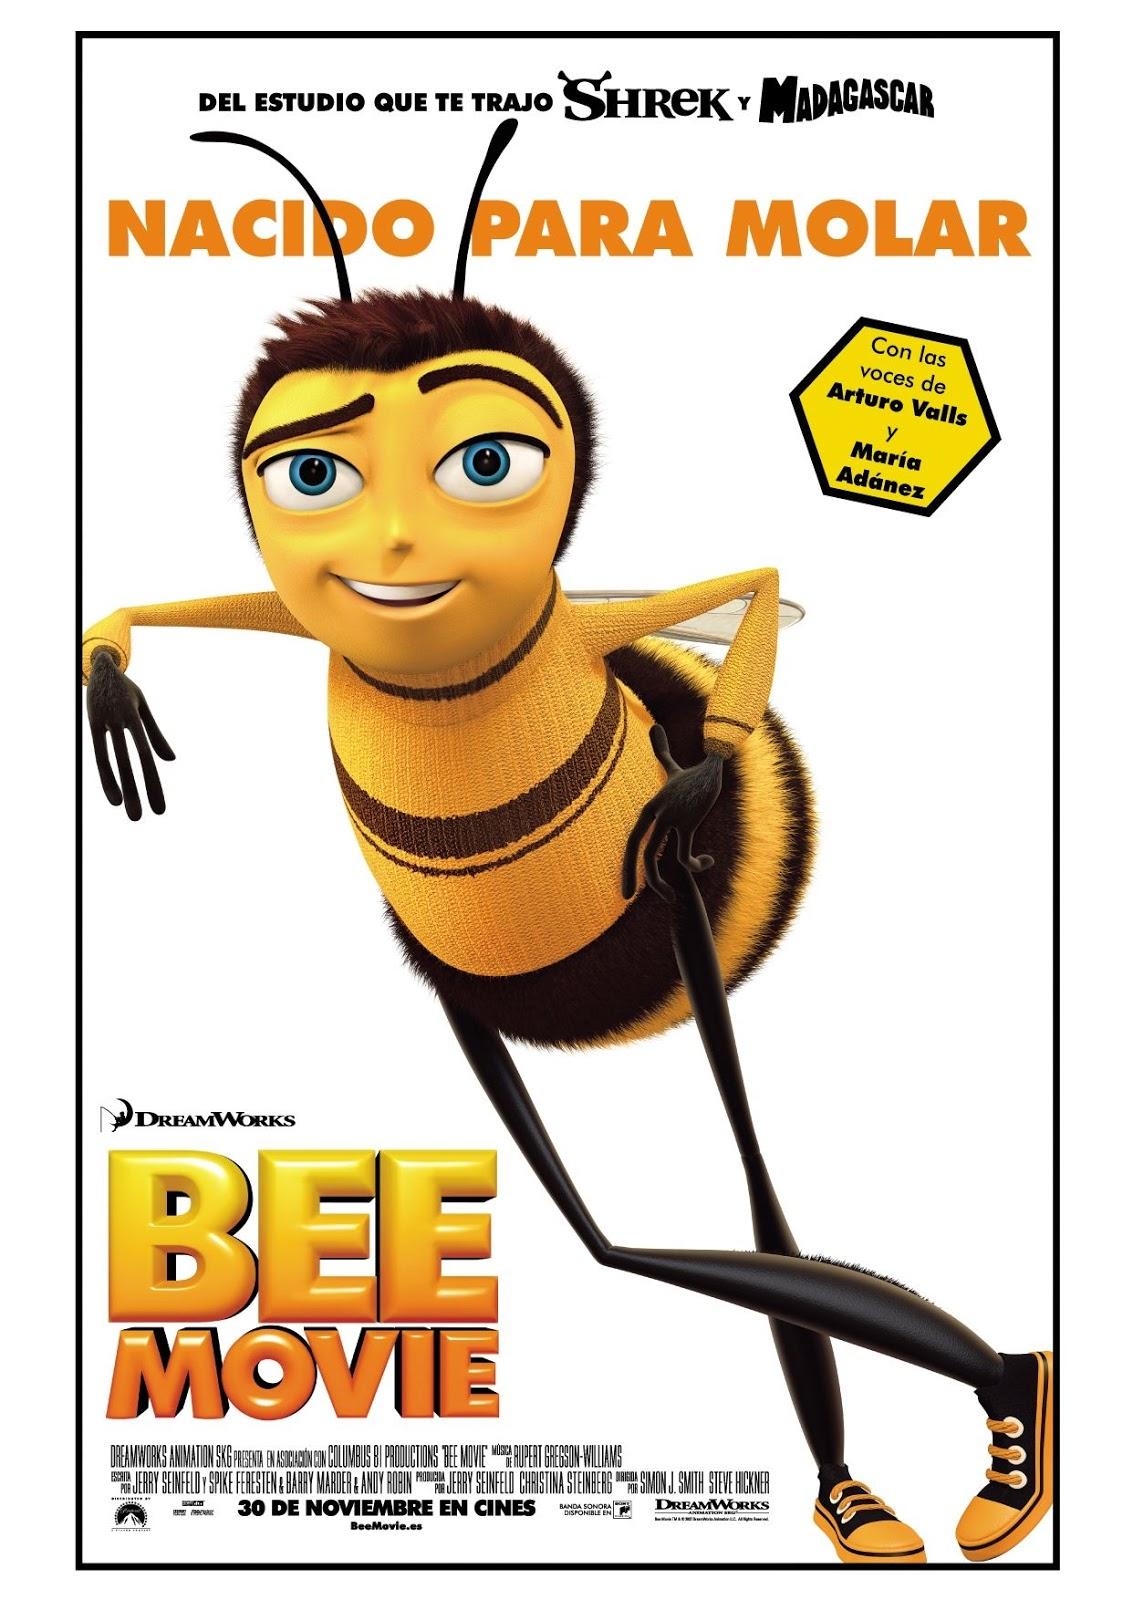 Bee Movie: La historia de abeja